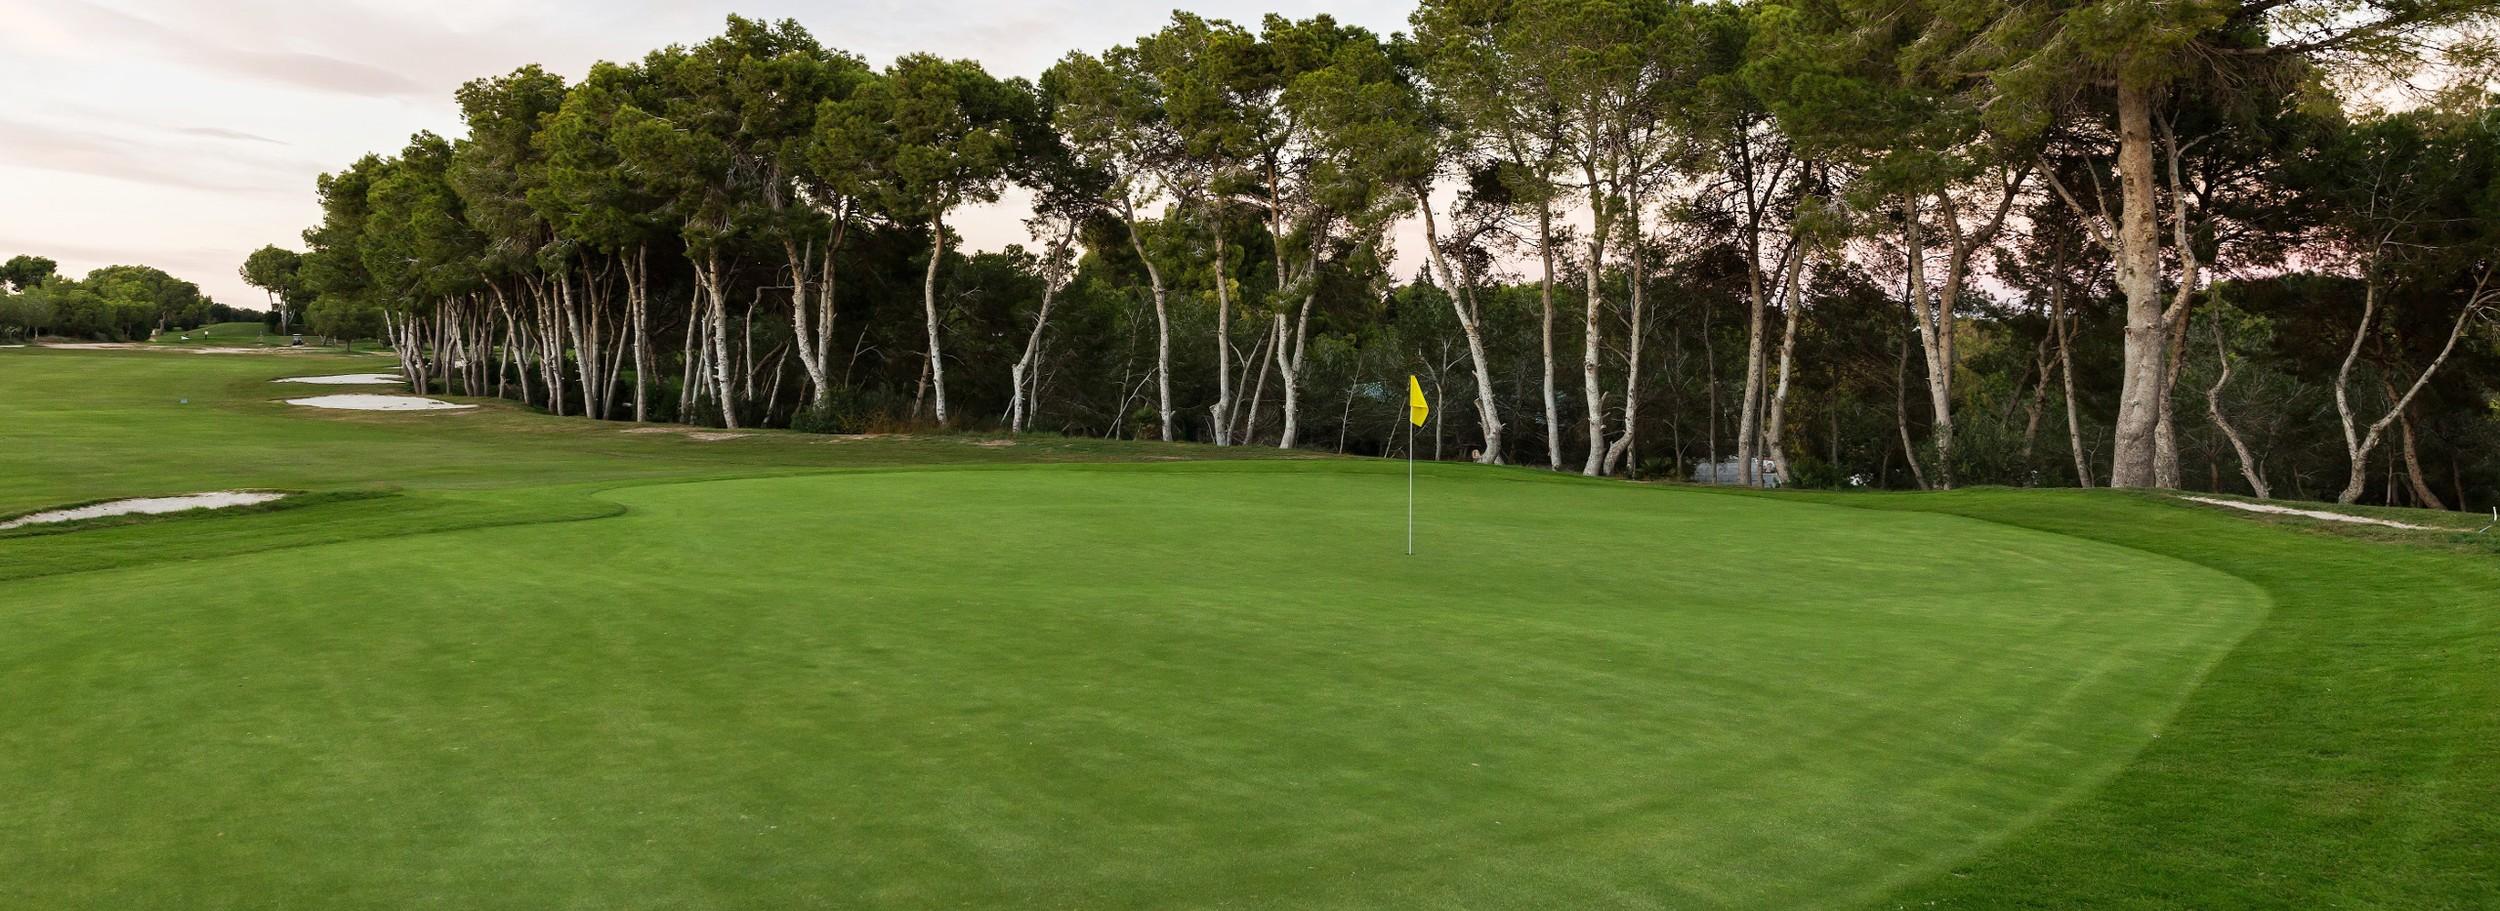 Villamartin Golf, Spain